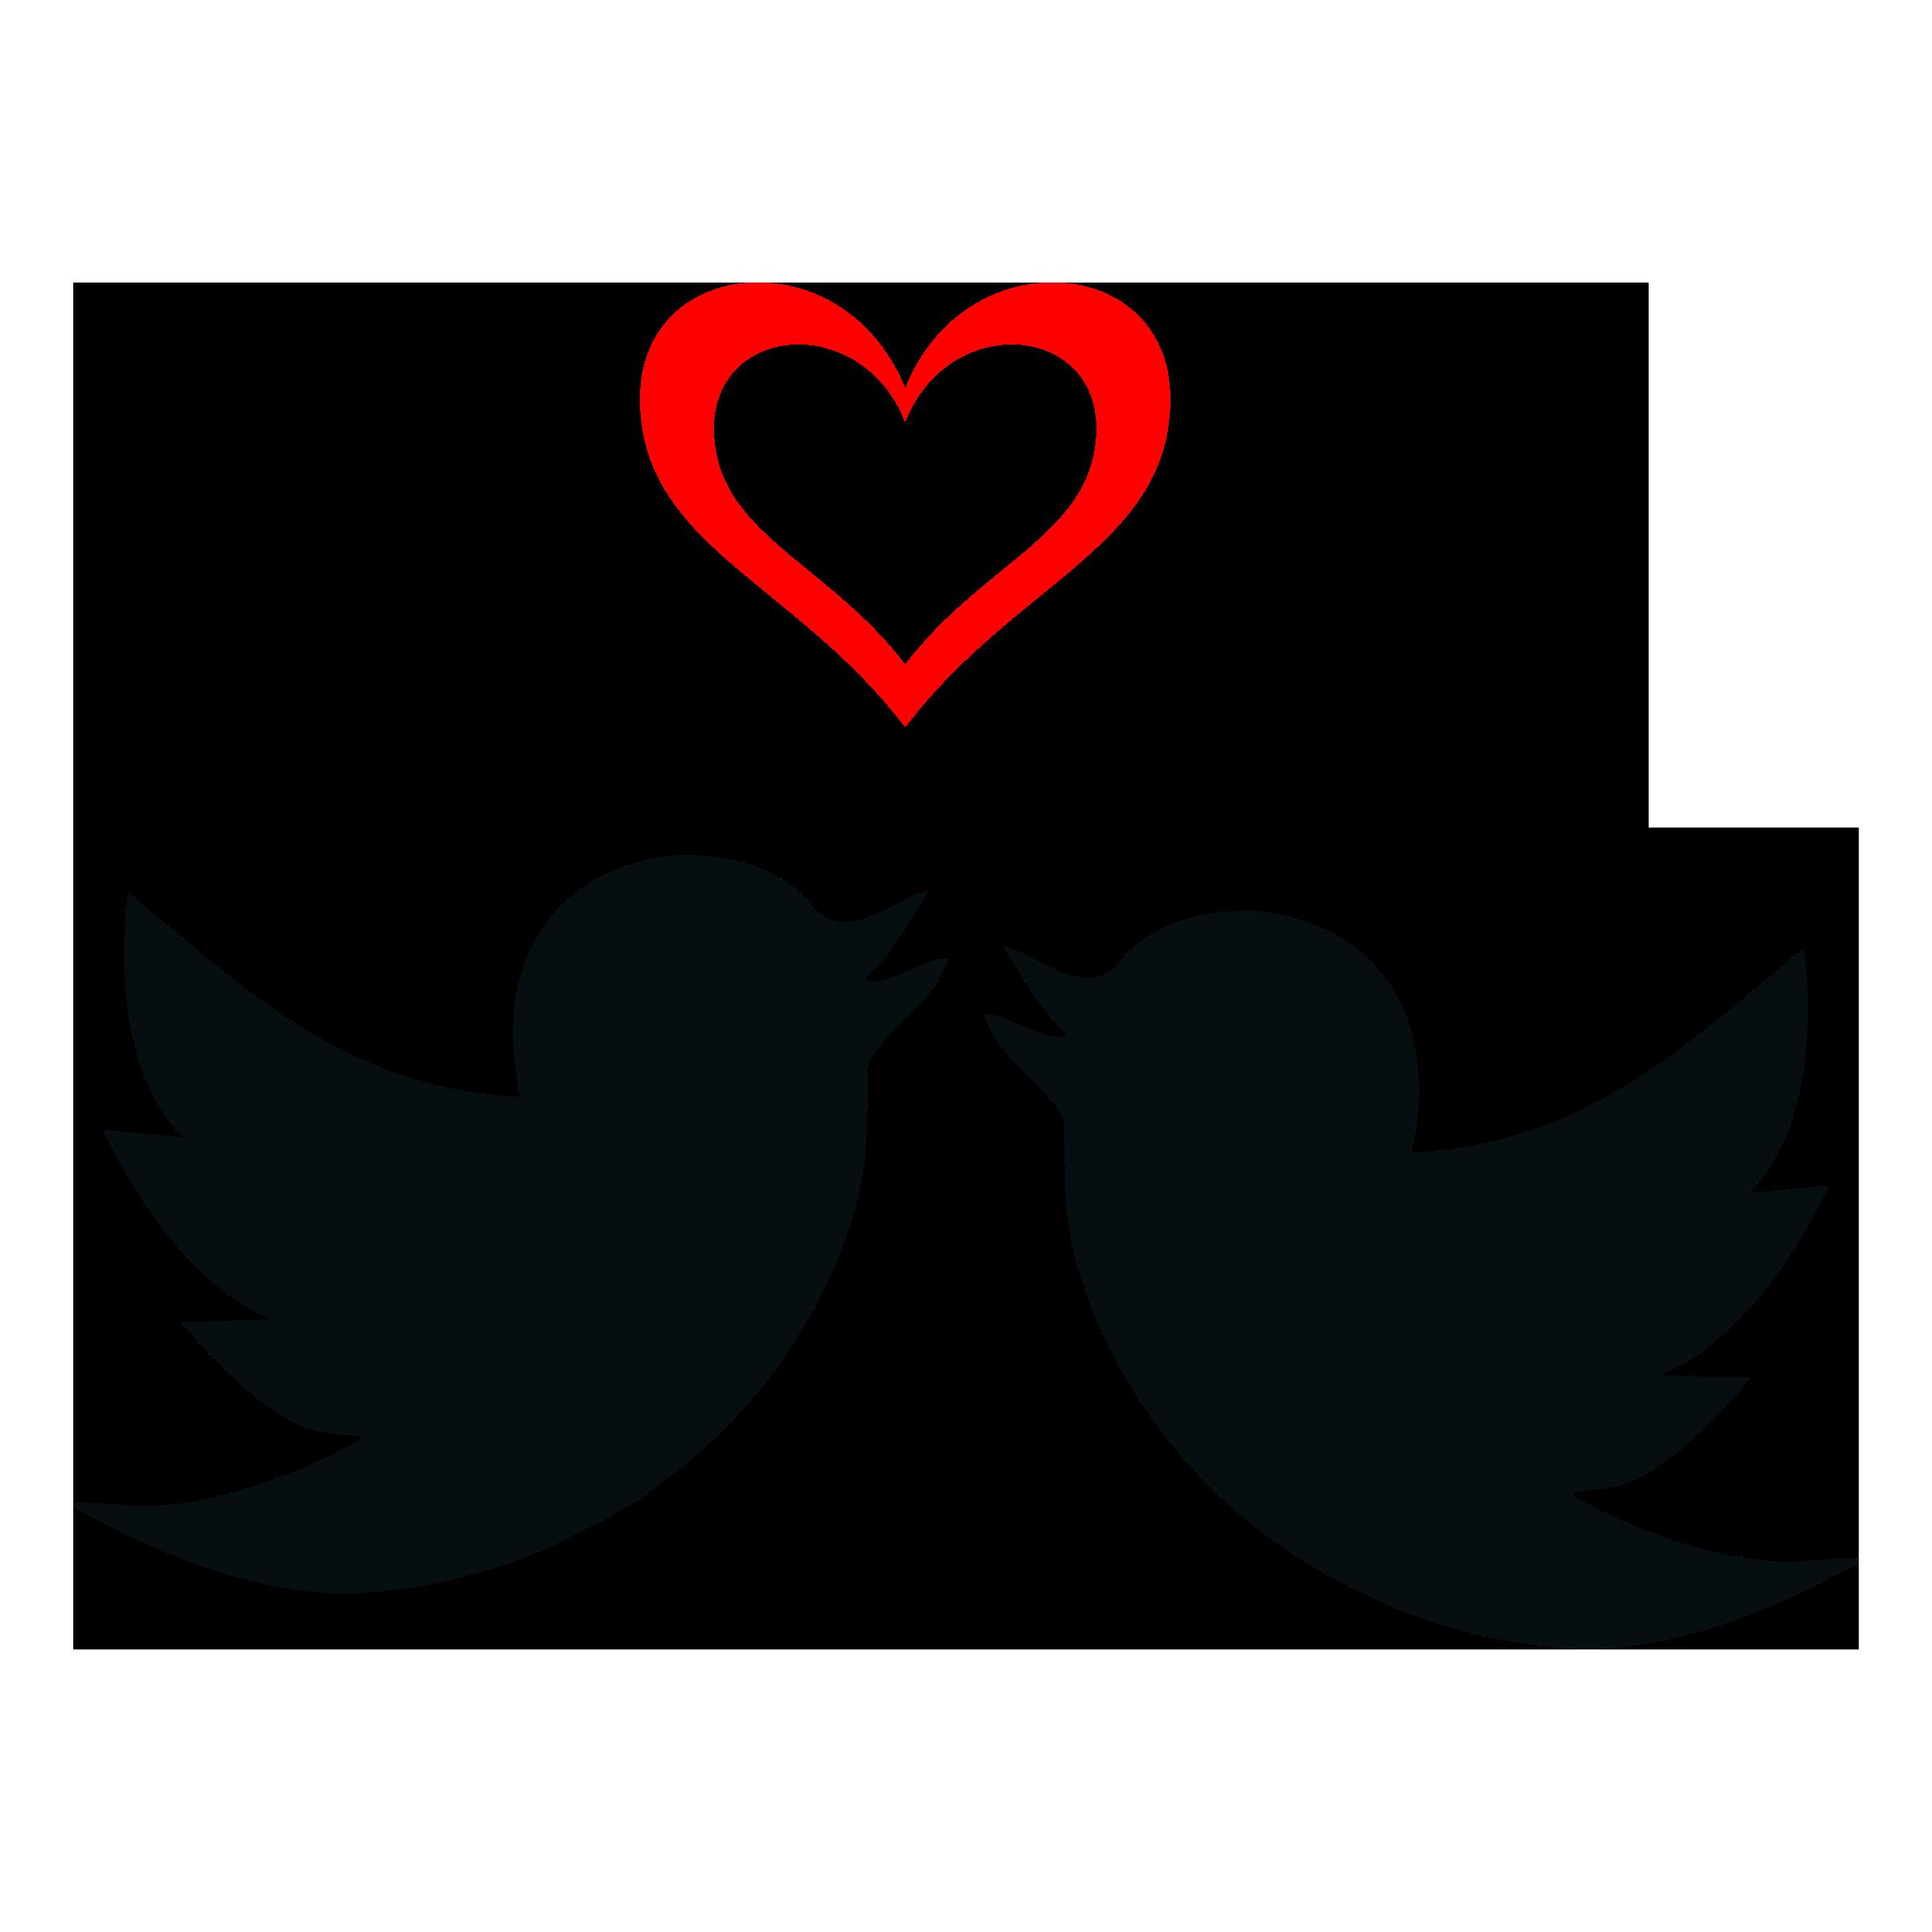 2400x2400 Clipart Bird Heart Blue Hugging A Clip Art Image âu20acu201c paberish.me